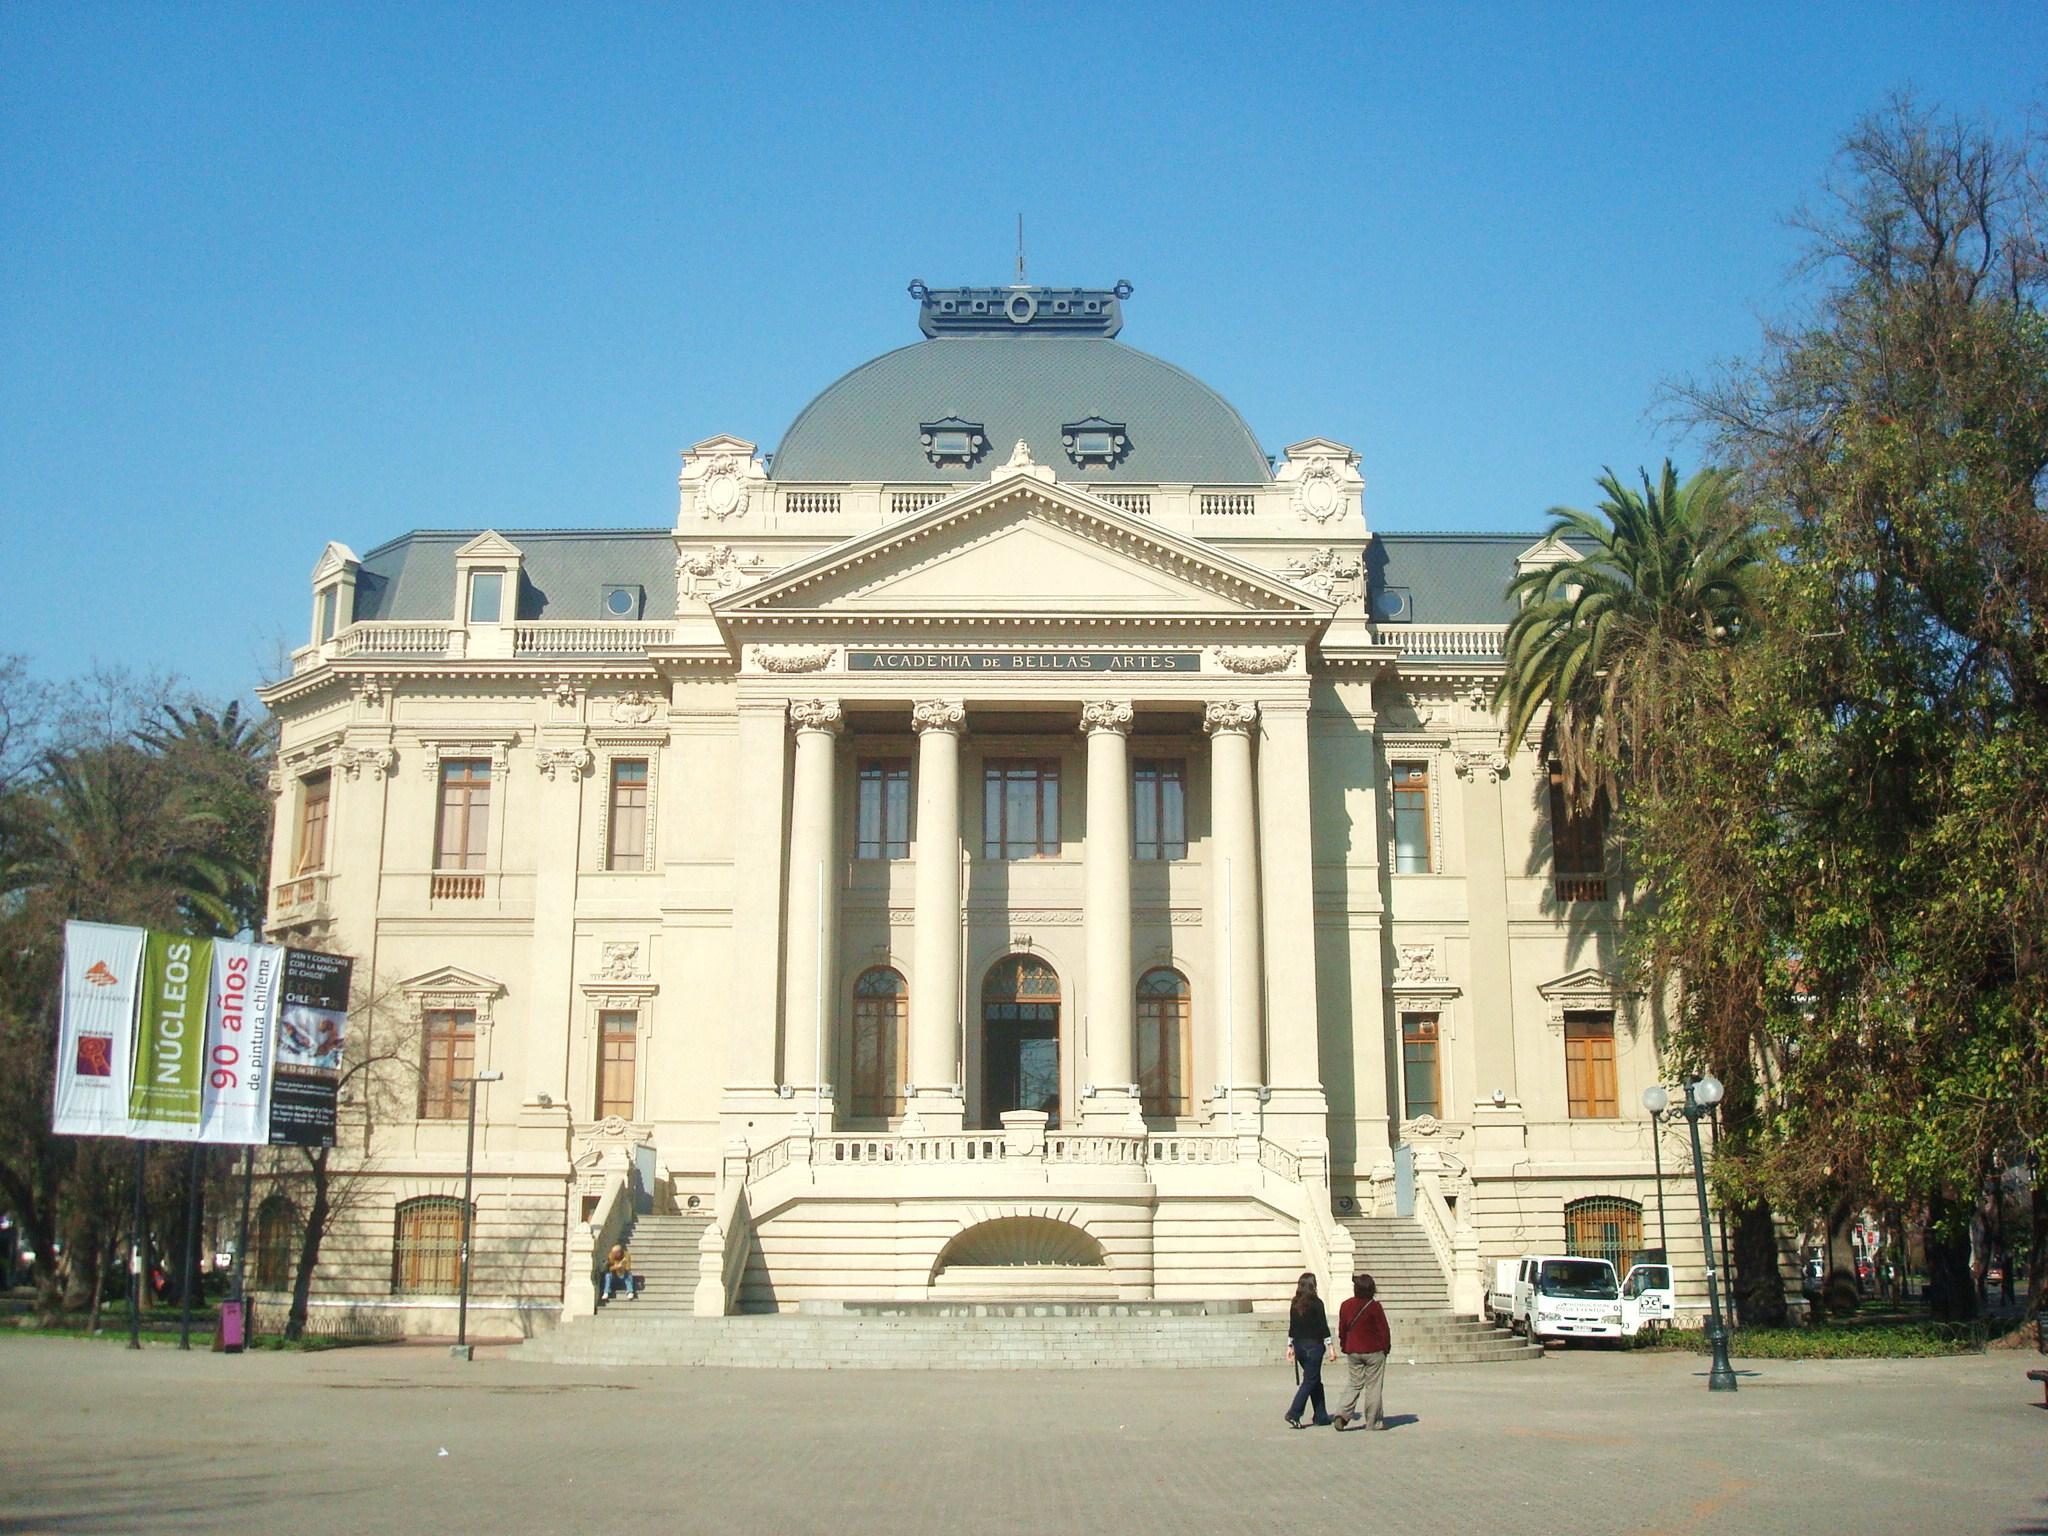 Museo De.File Museo De Arte Contemporaneo Santiago Jpg Wikimedia Commons